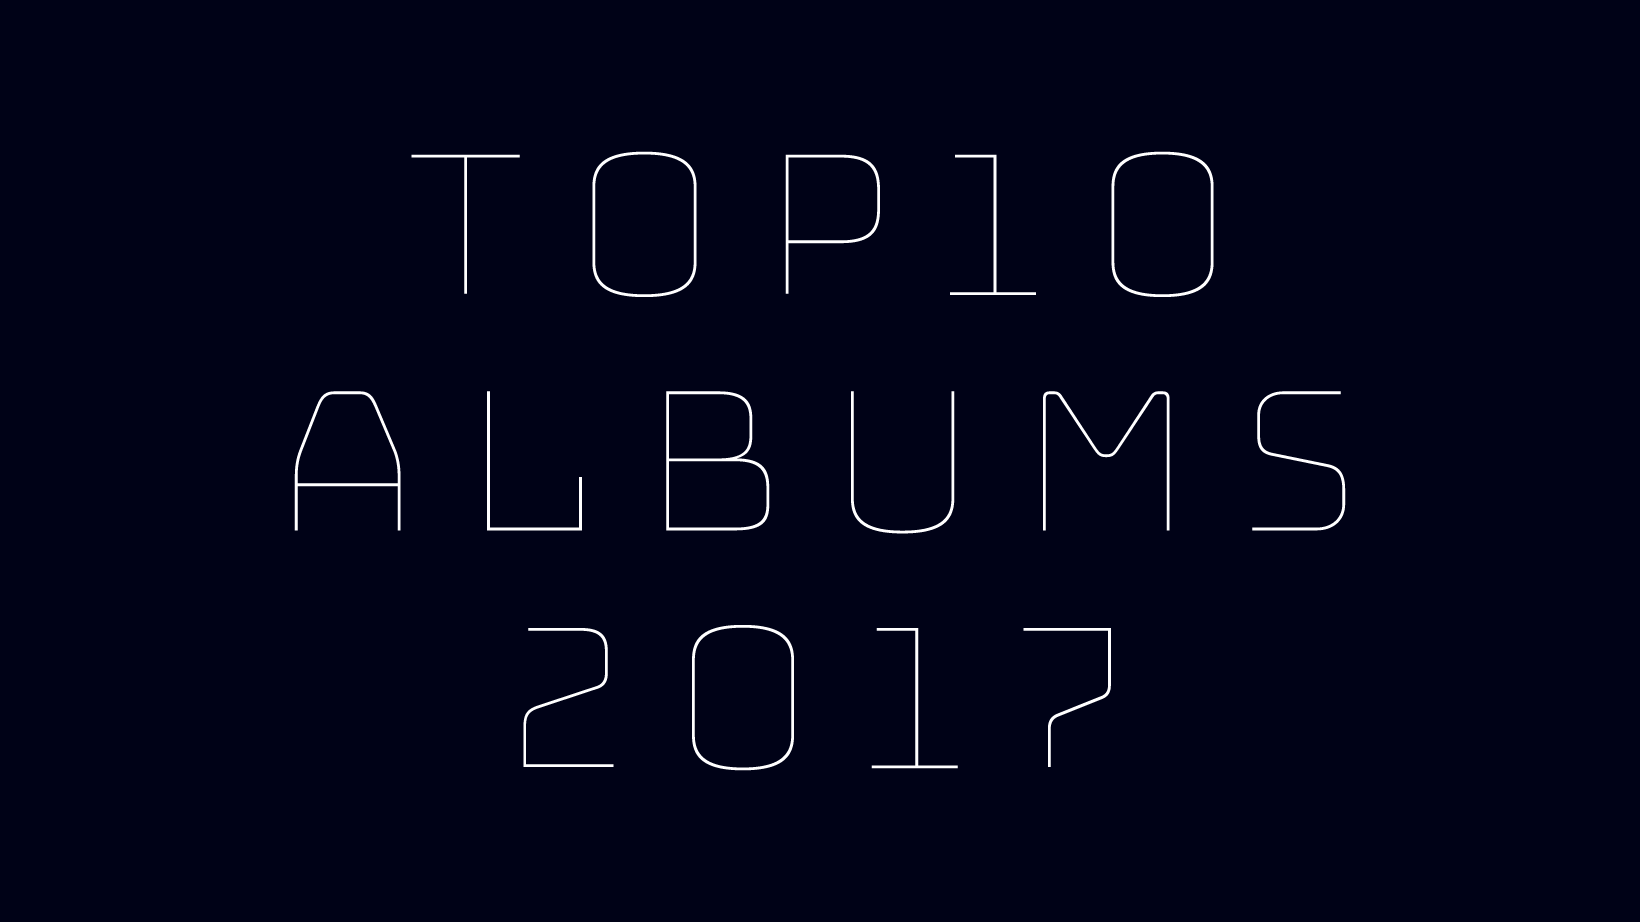 TOP 10 ALBUMS 2017 - 2017年によく聴いたアルバム10枚